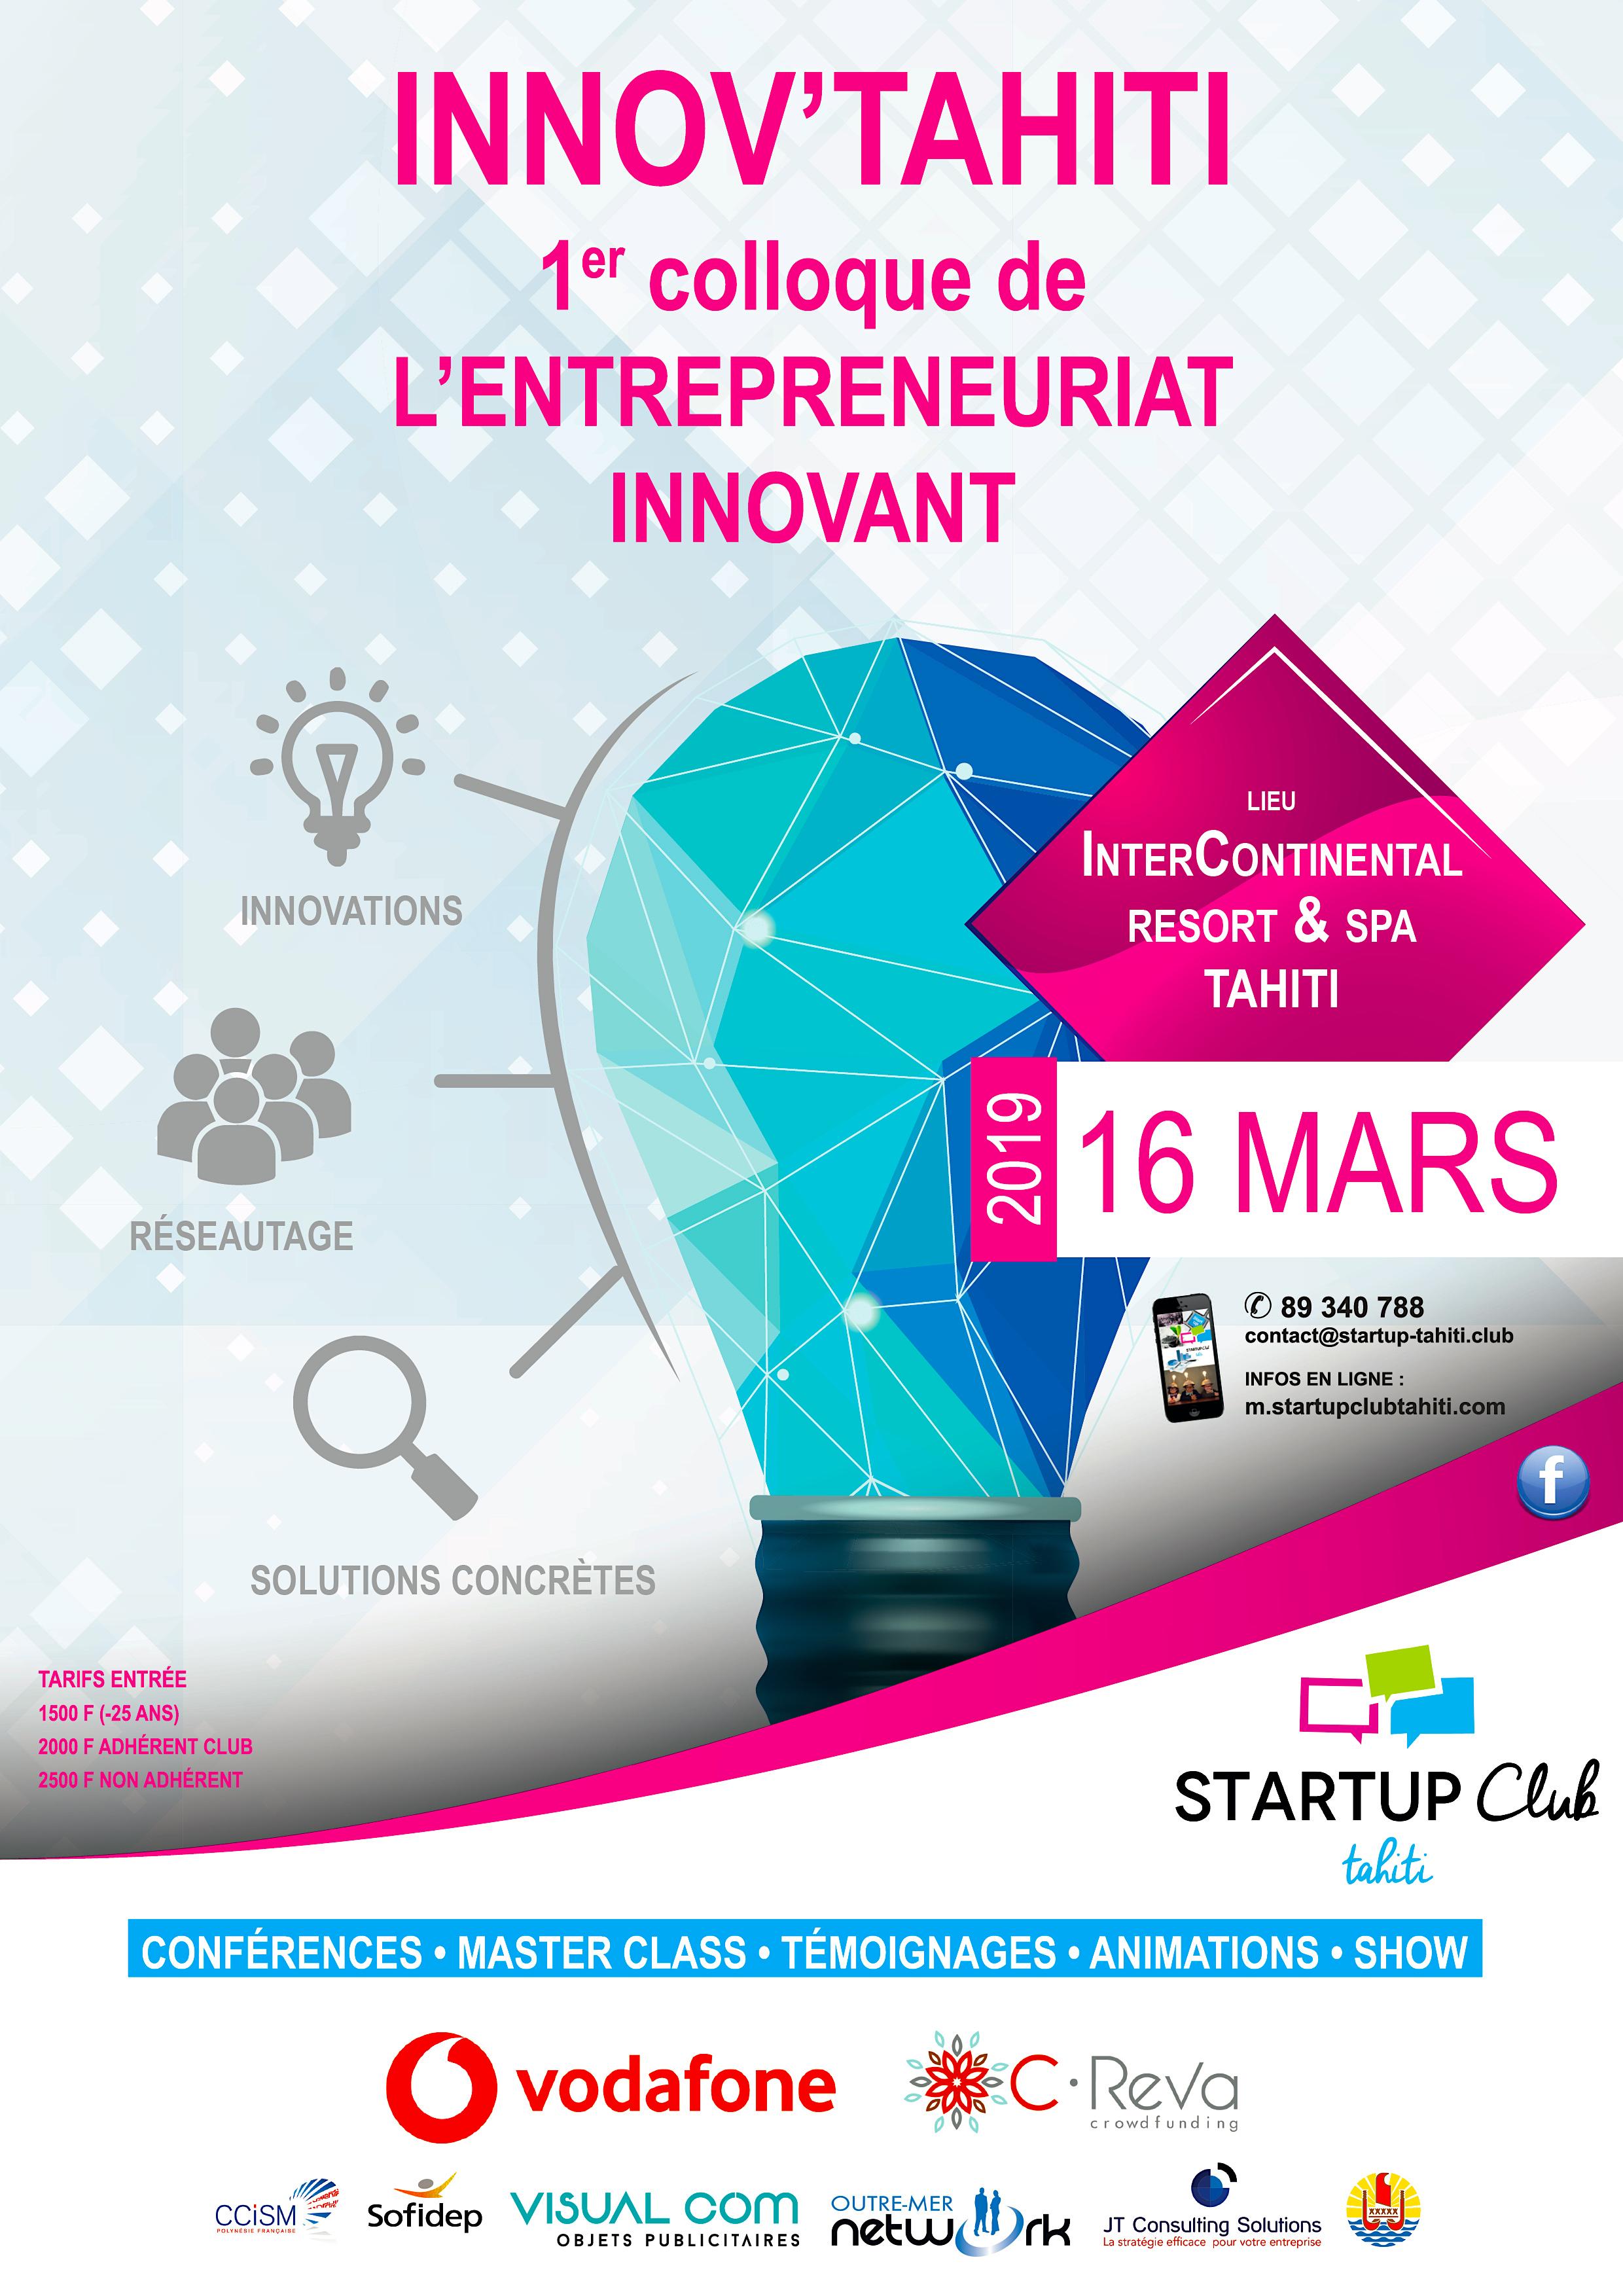 Le 1er colloque de l'entrepreneuriat innovant prévu samedi 16 mars